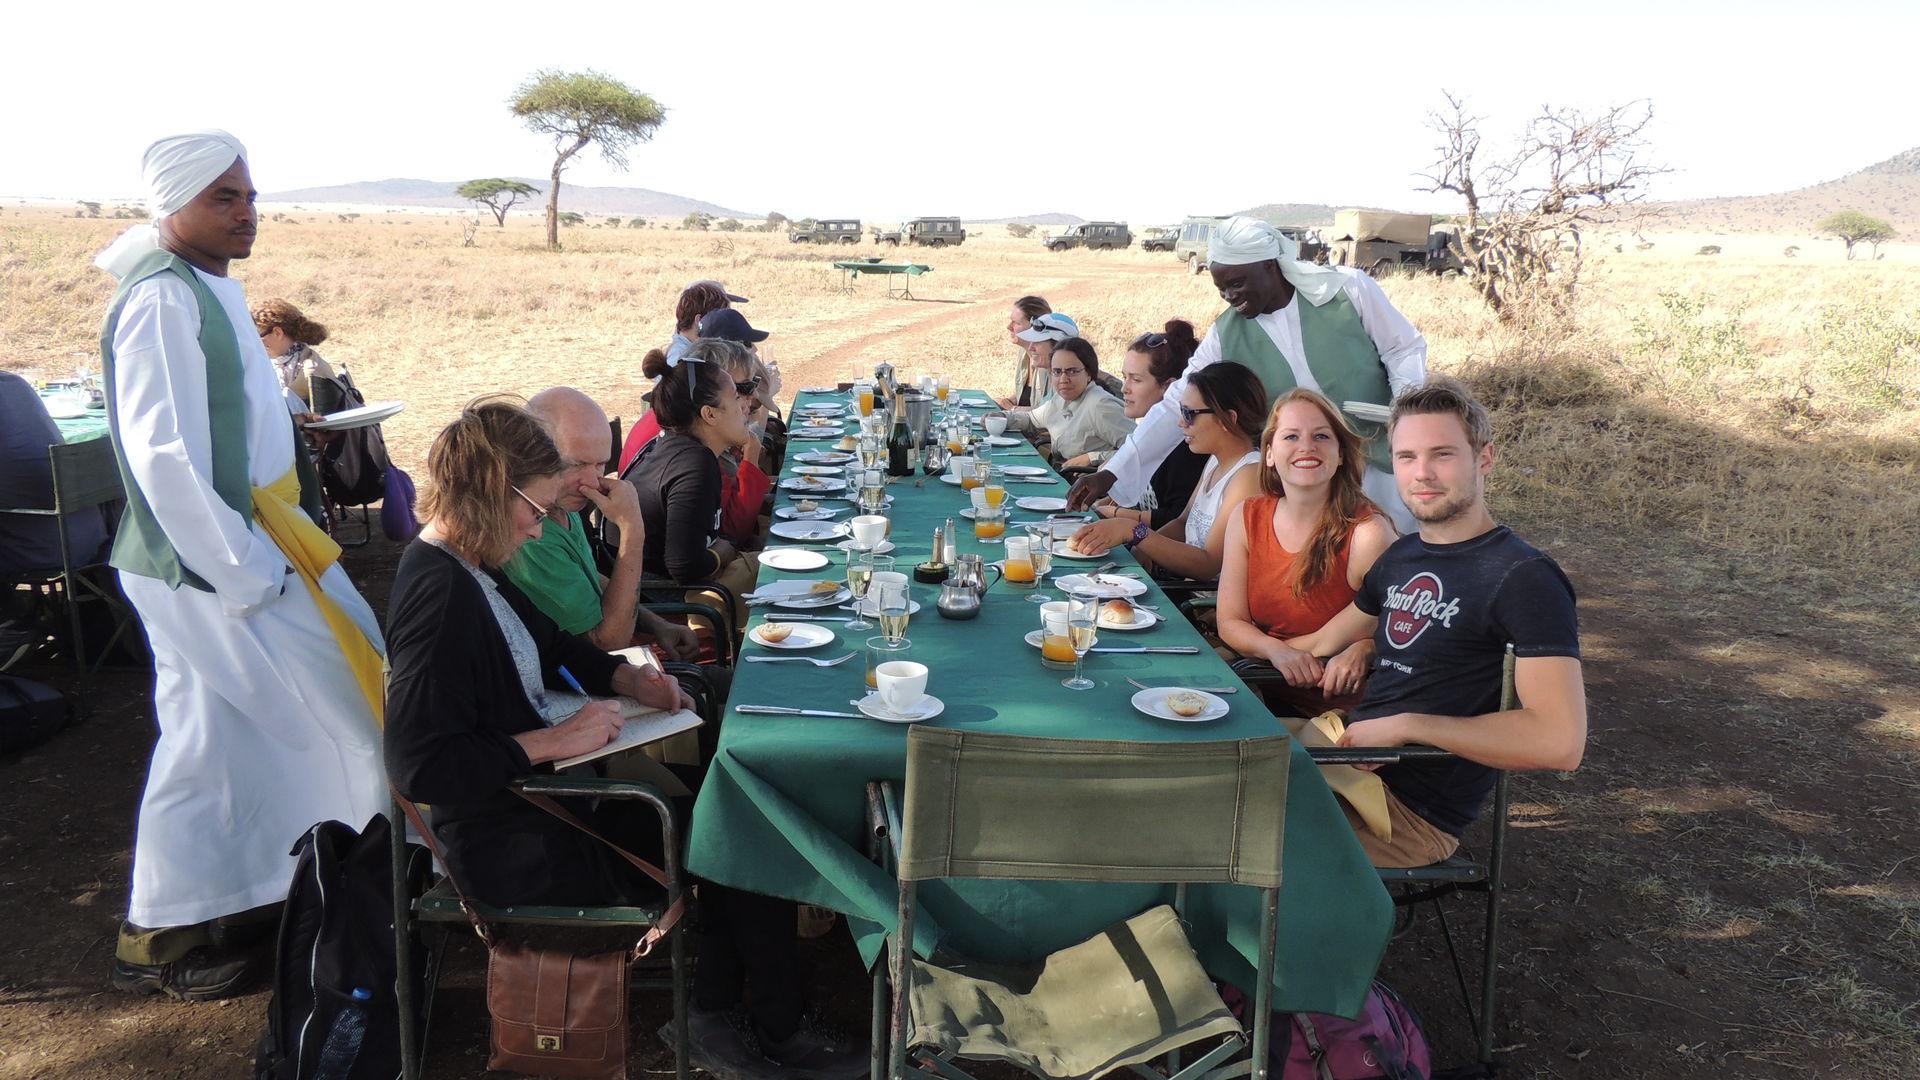 Ballonvaart Tanzania - De Serengeti vanuit een luchtballon